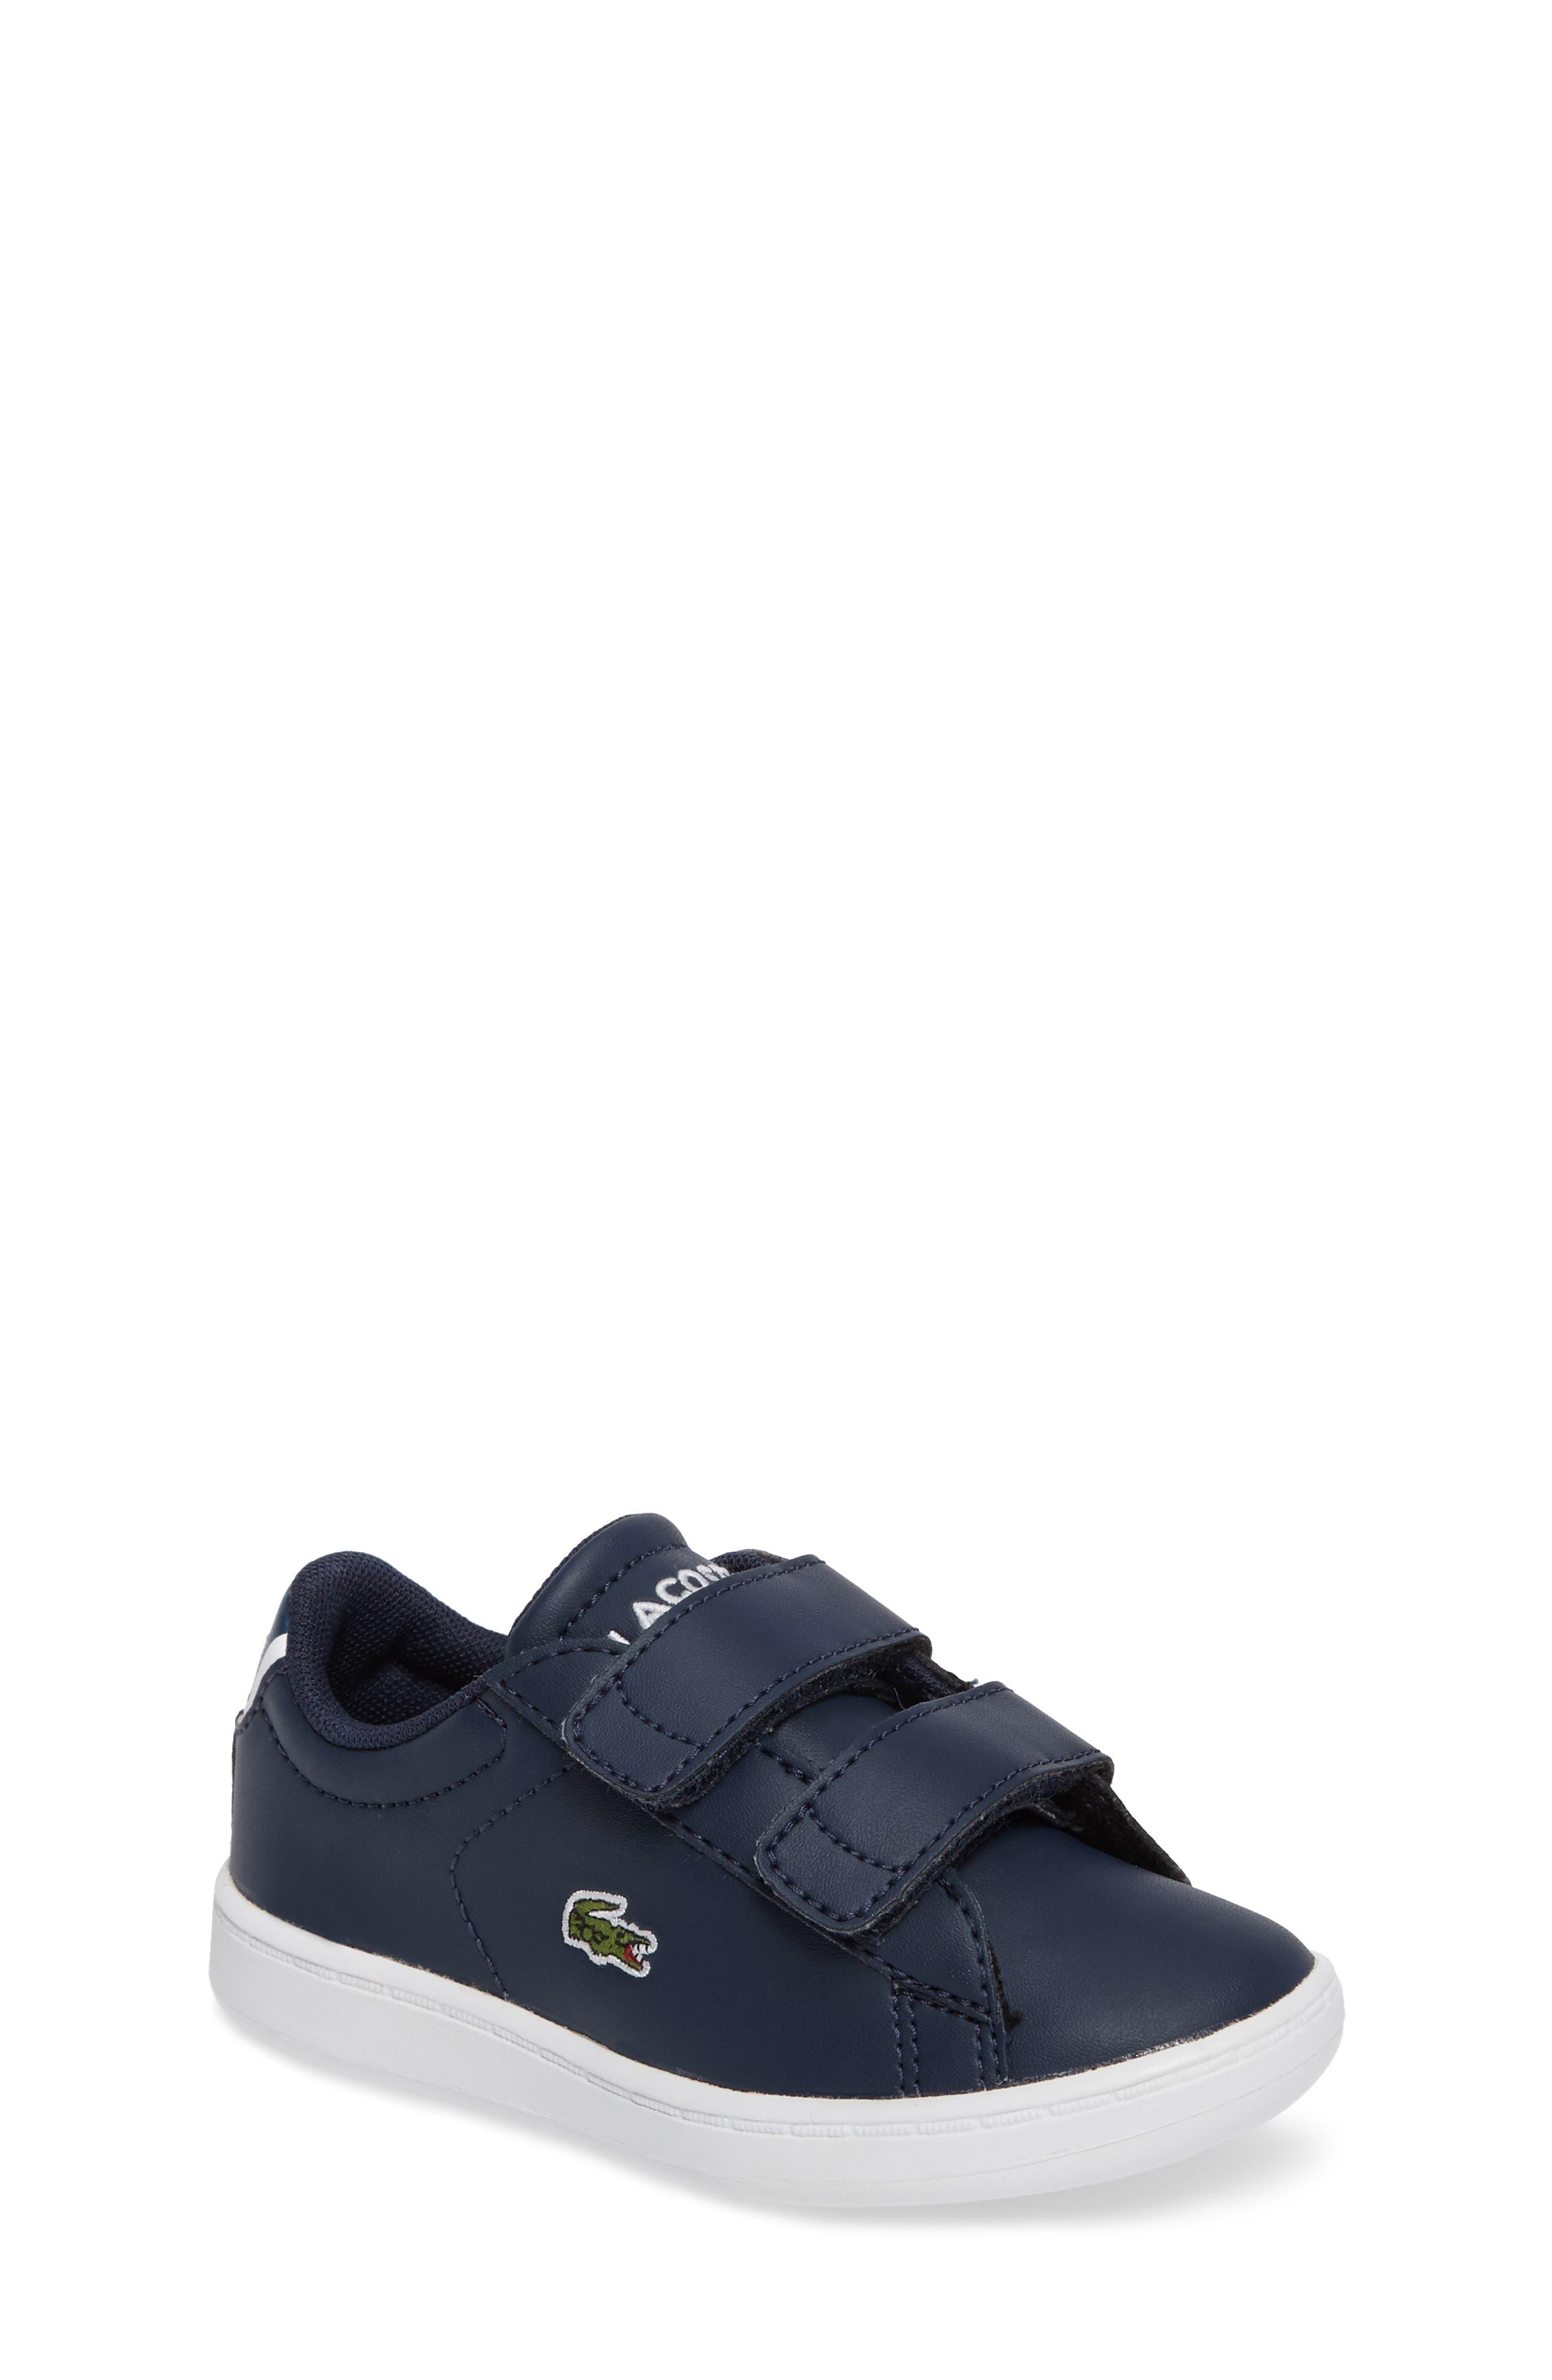 Alternate Image 1 Selected - Lacoste Carnaby Evo Sneaker (Baby, Walker, Toddler & Little Kid)